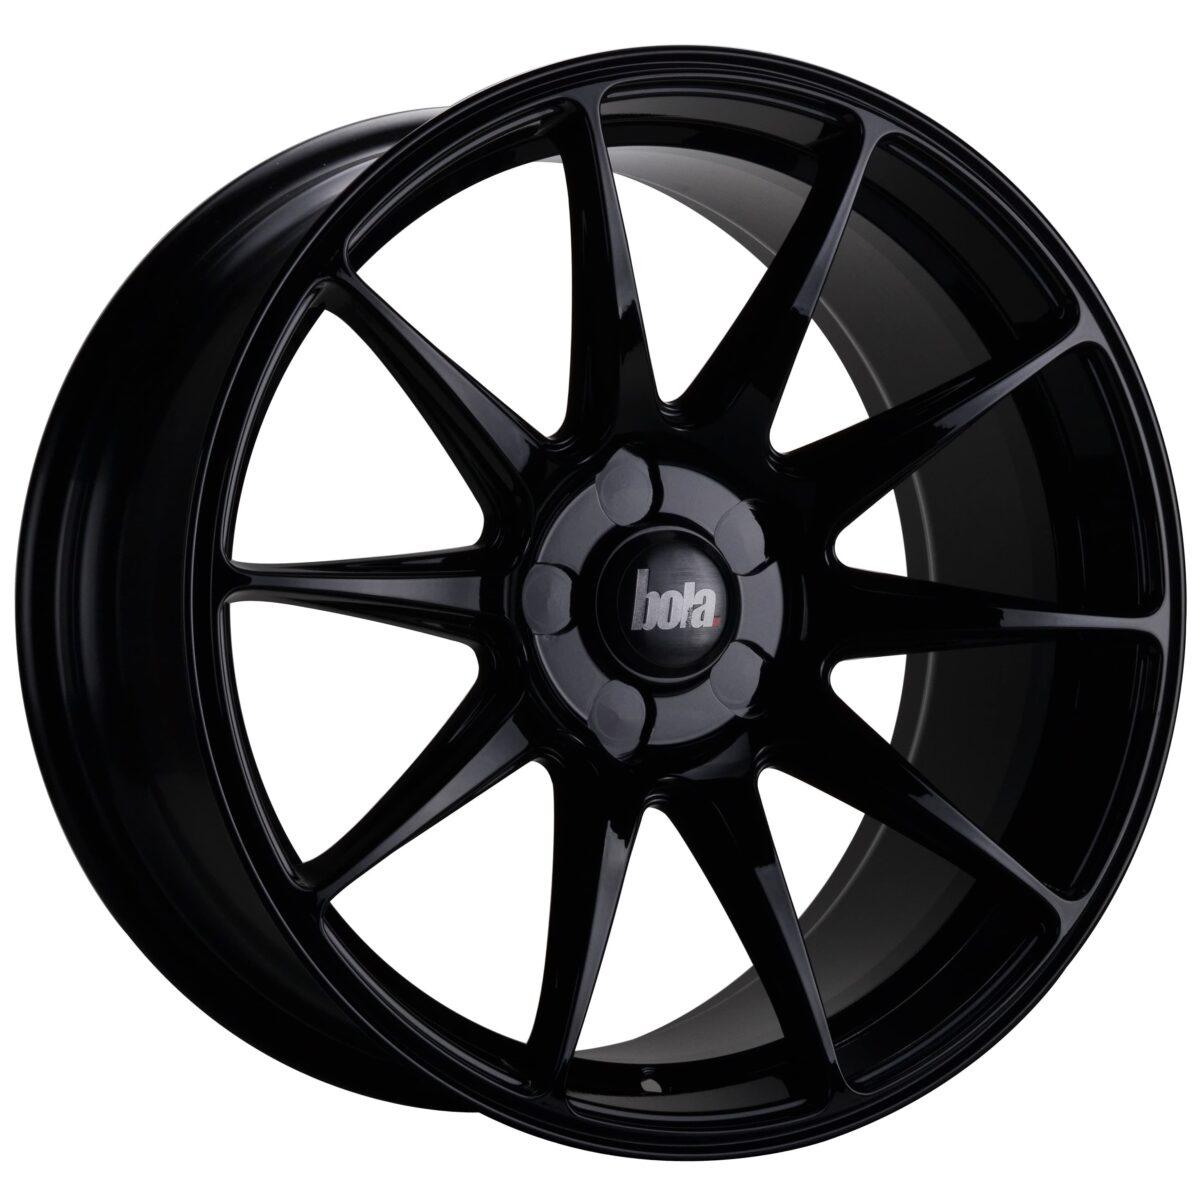 "18"" BOLA B15 Wheels - Gloss Black - VW / Audi / Mercedes - 5x112"